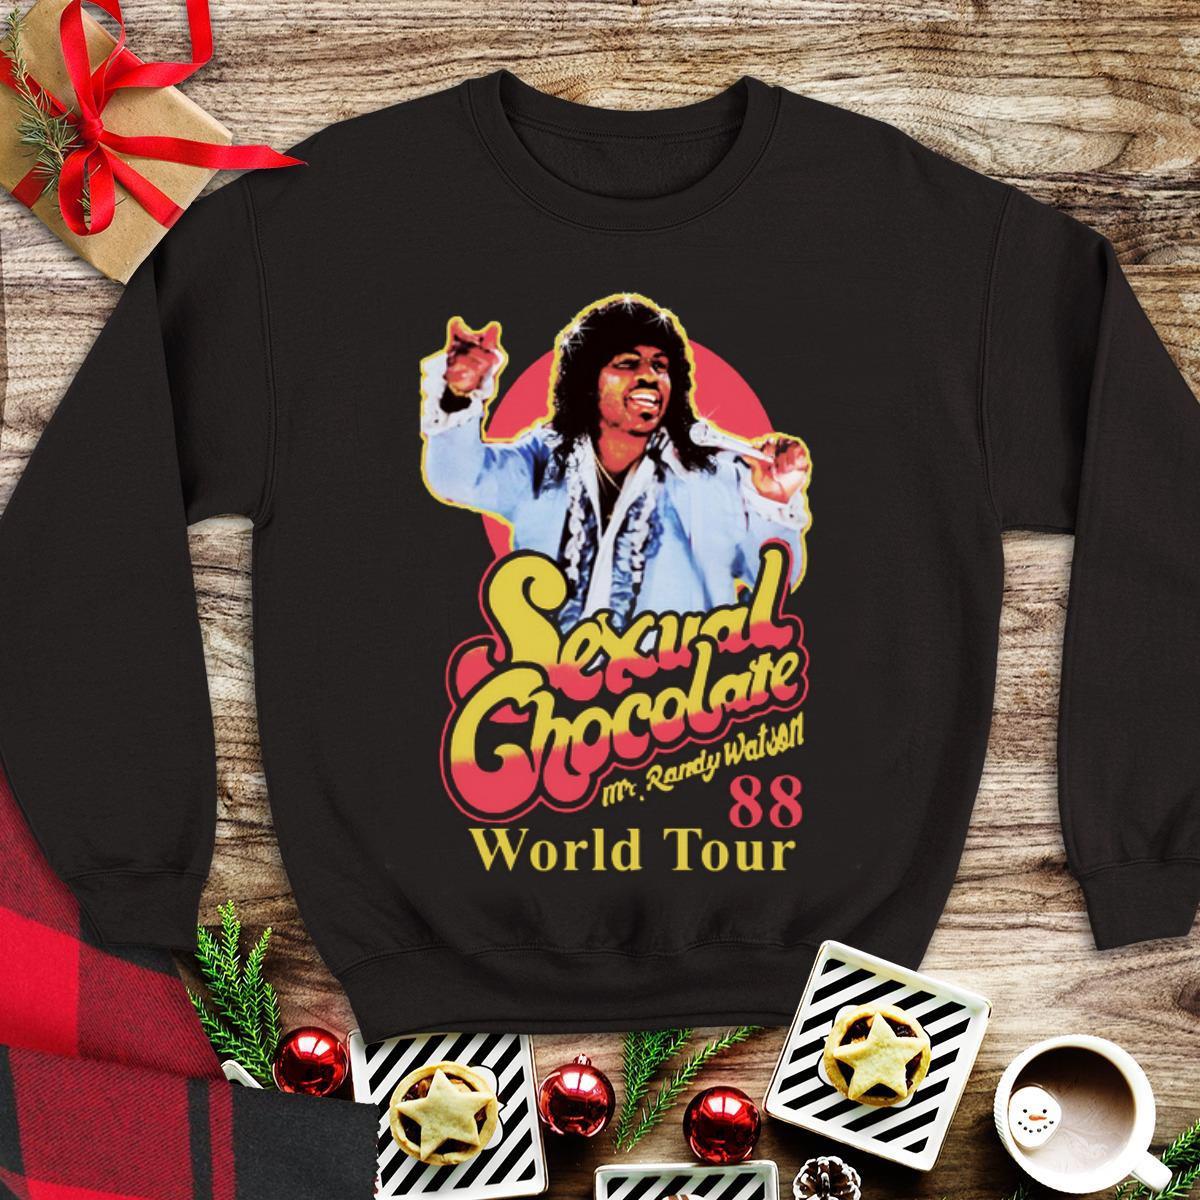 Awesome Mr Randy Watson World Tour 88 Sexual Chocolate shirt